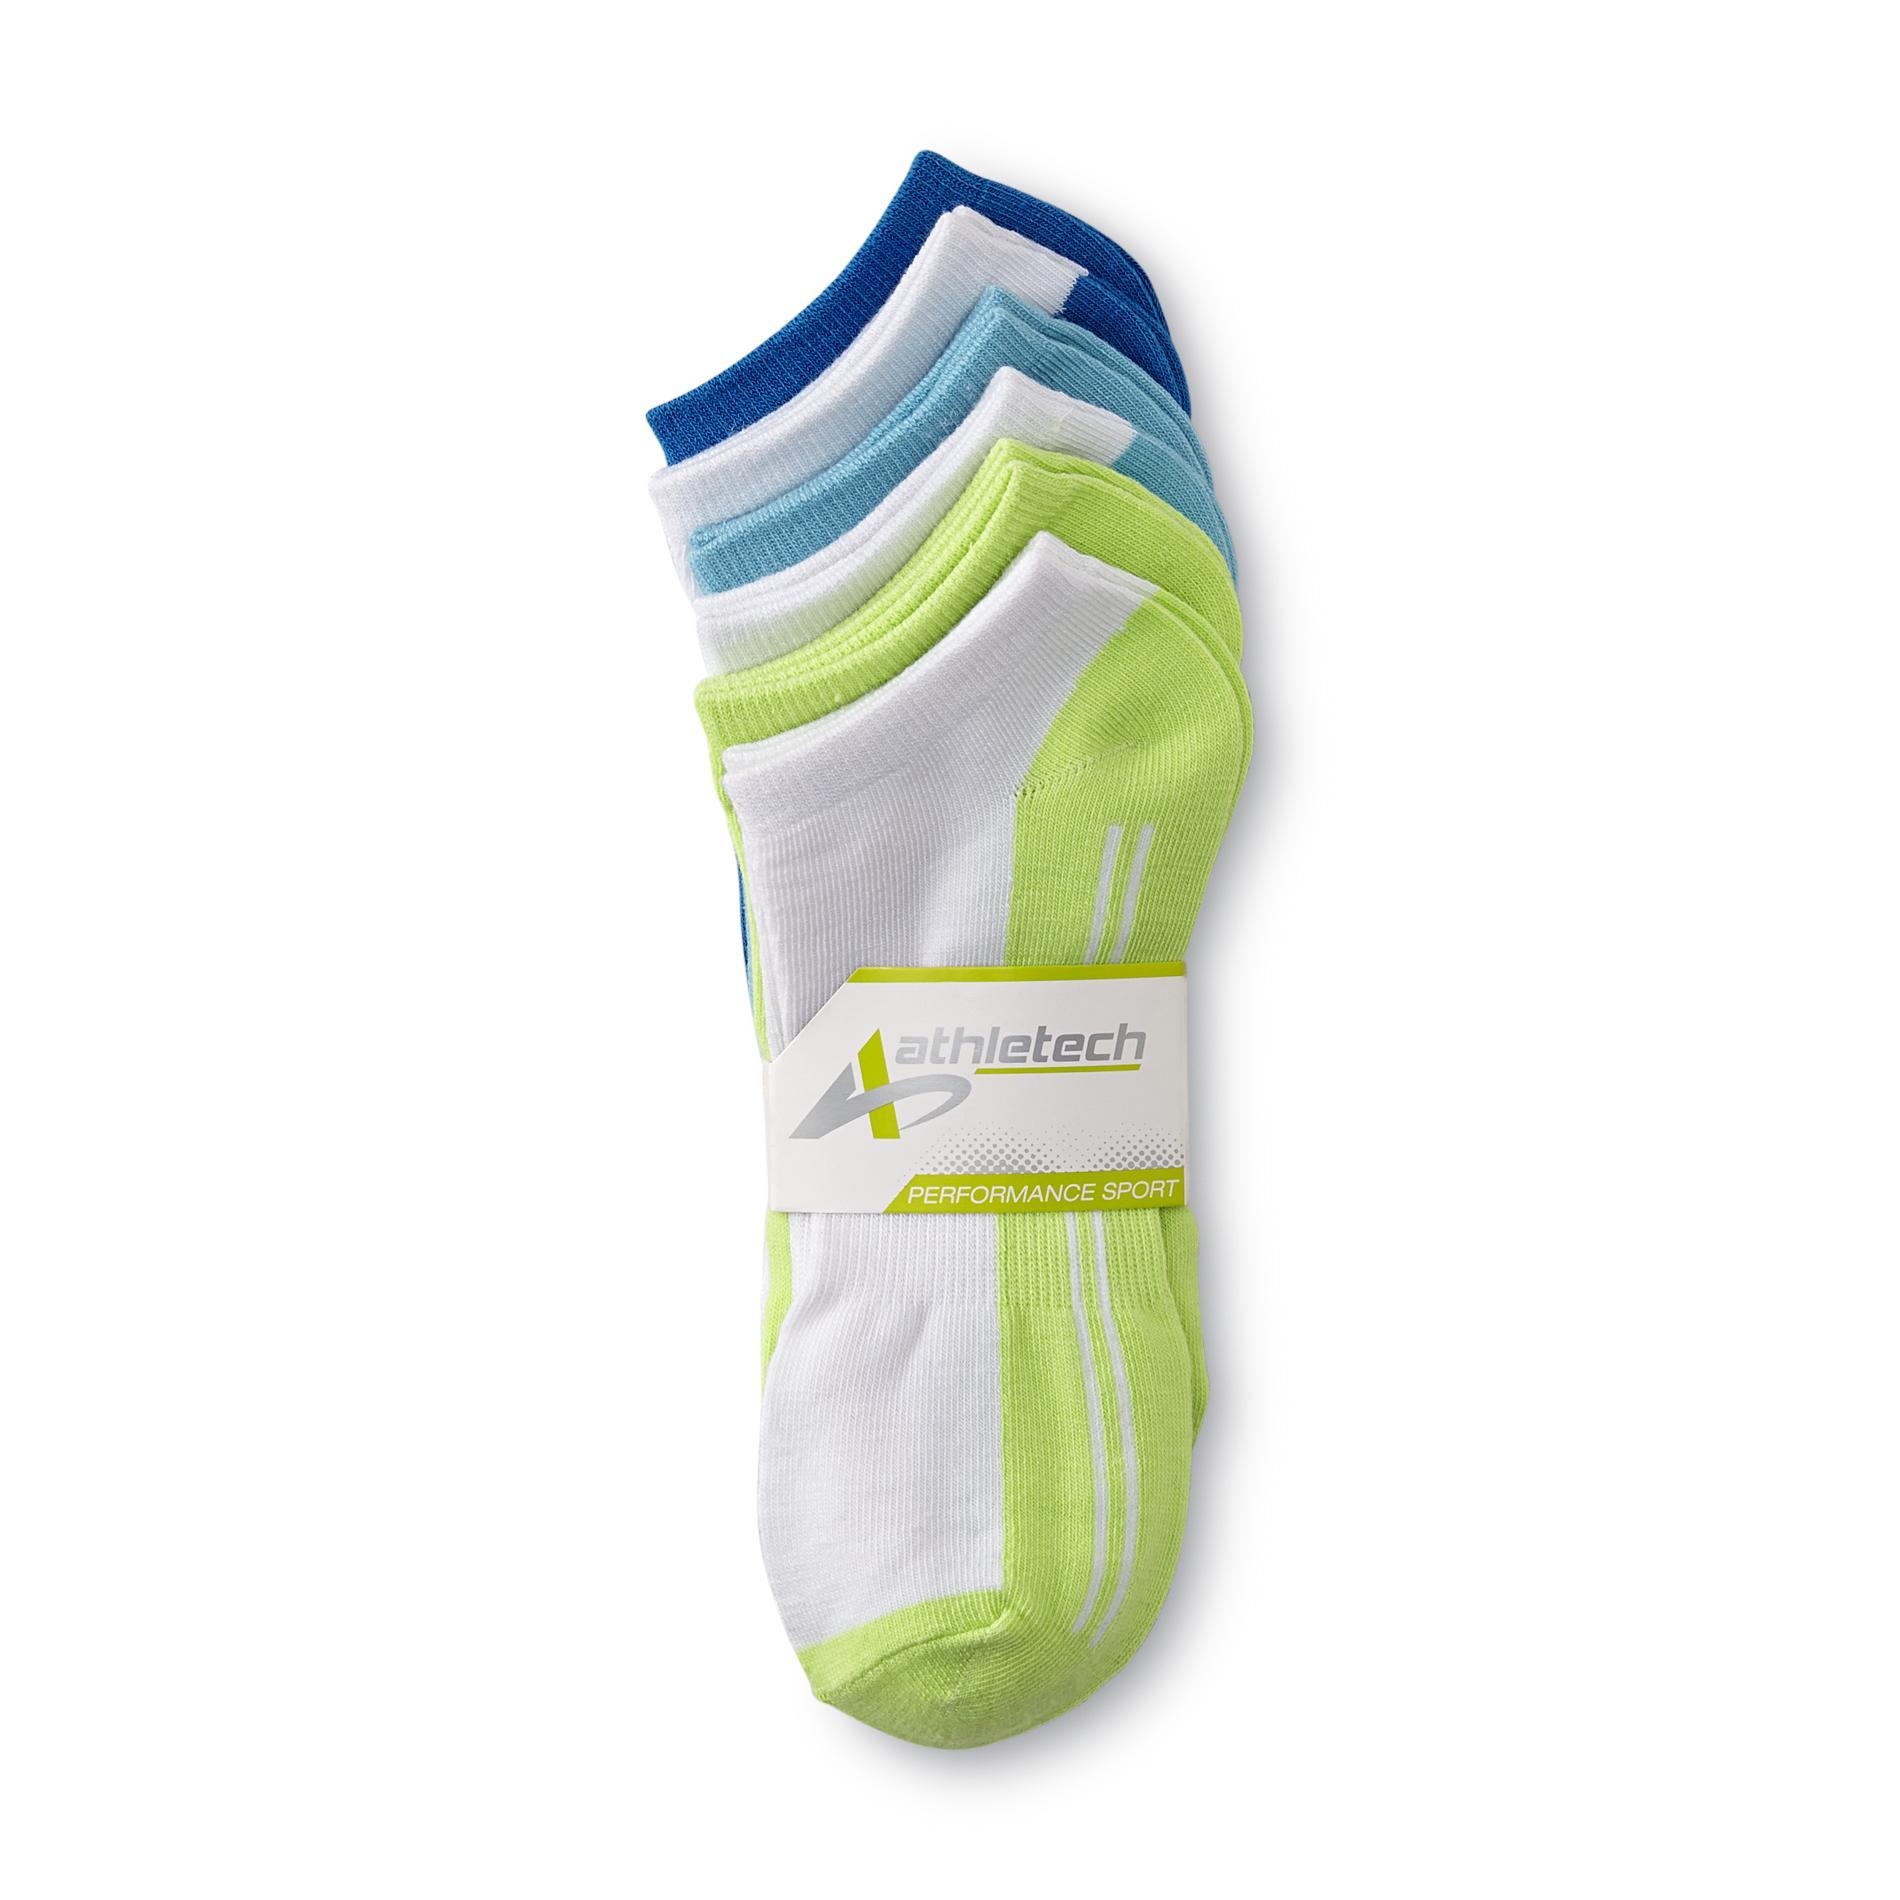 Athletech Women's 6-Pairs No-Show Performance Sport Socks